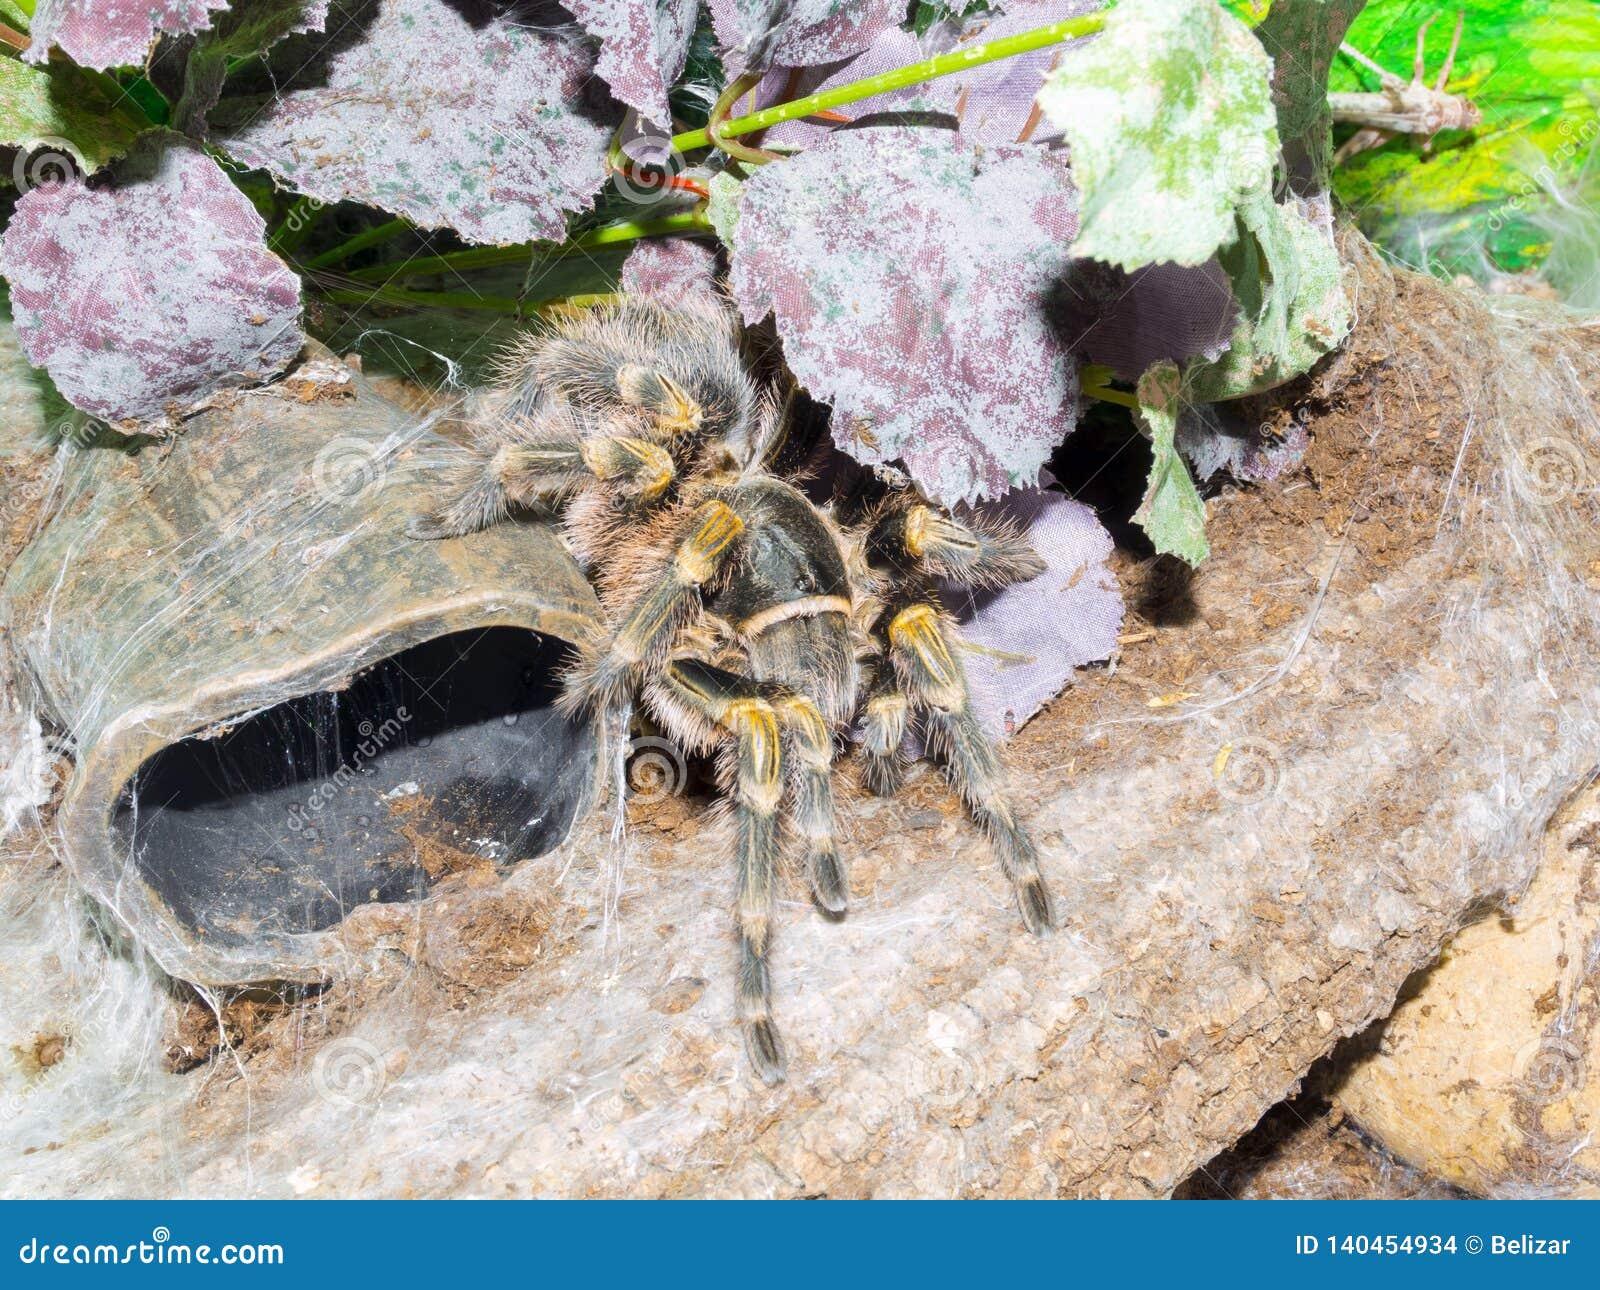 Chaco golden knee spider